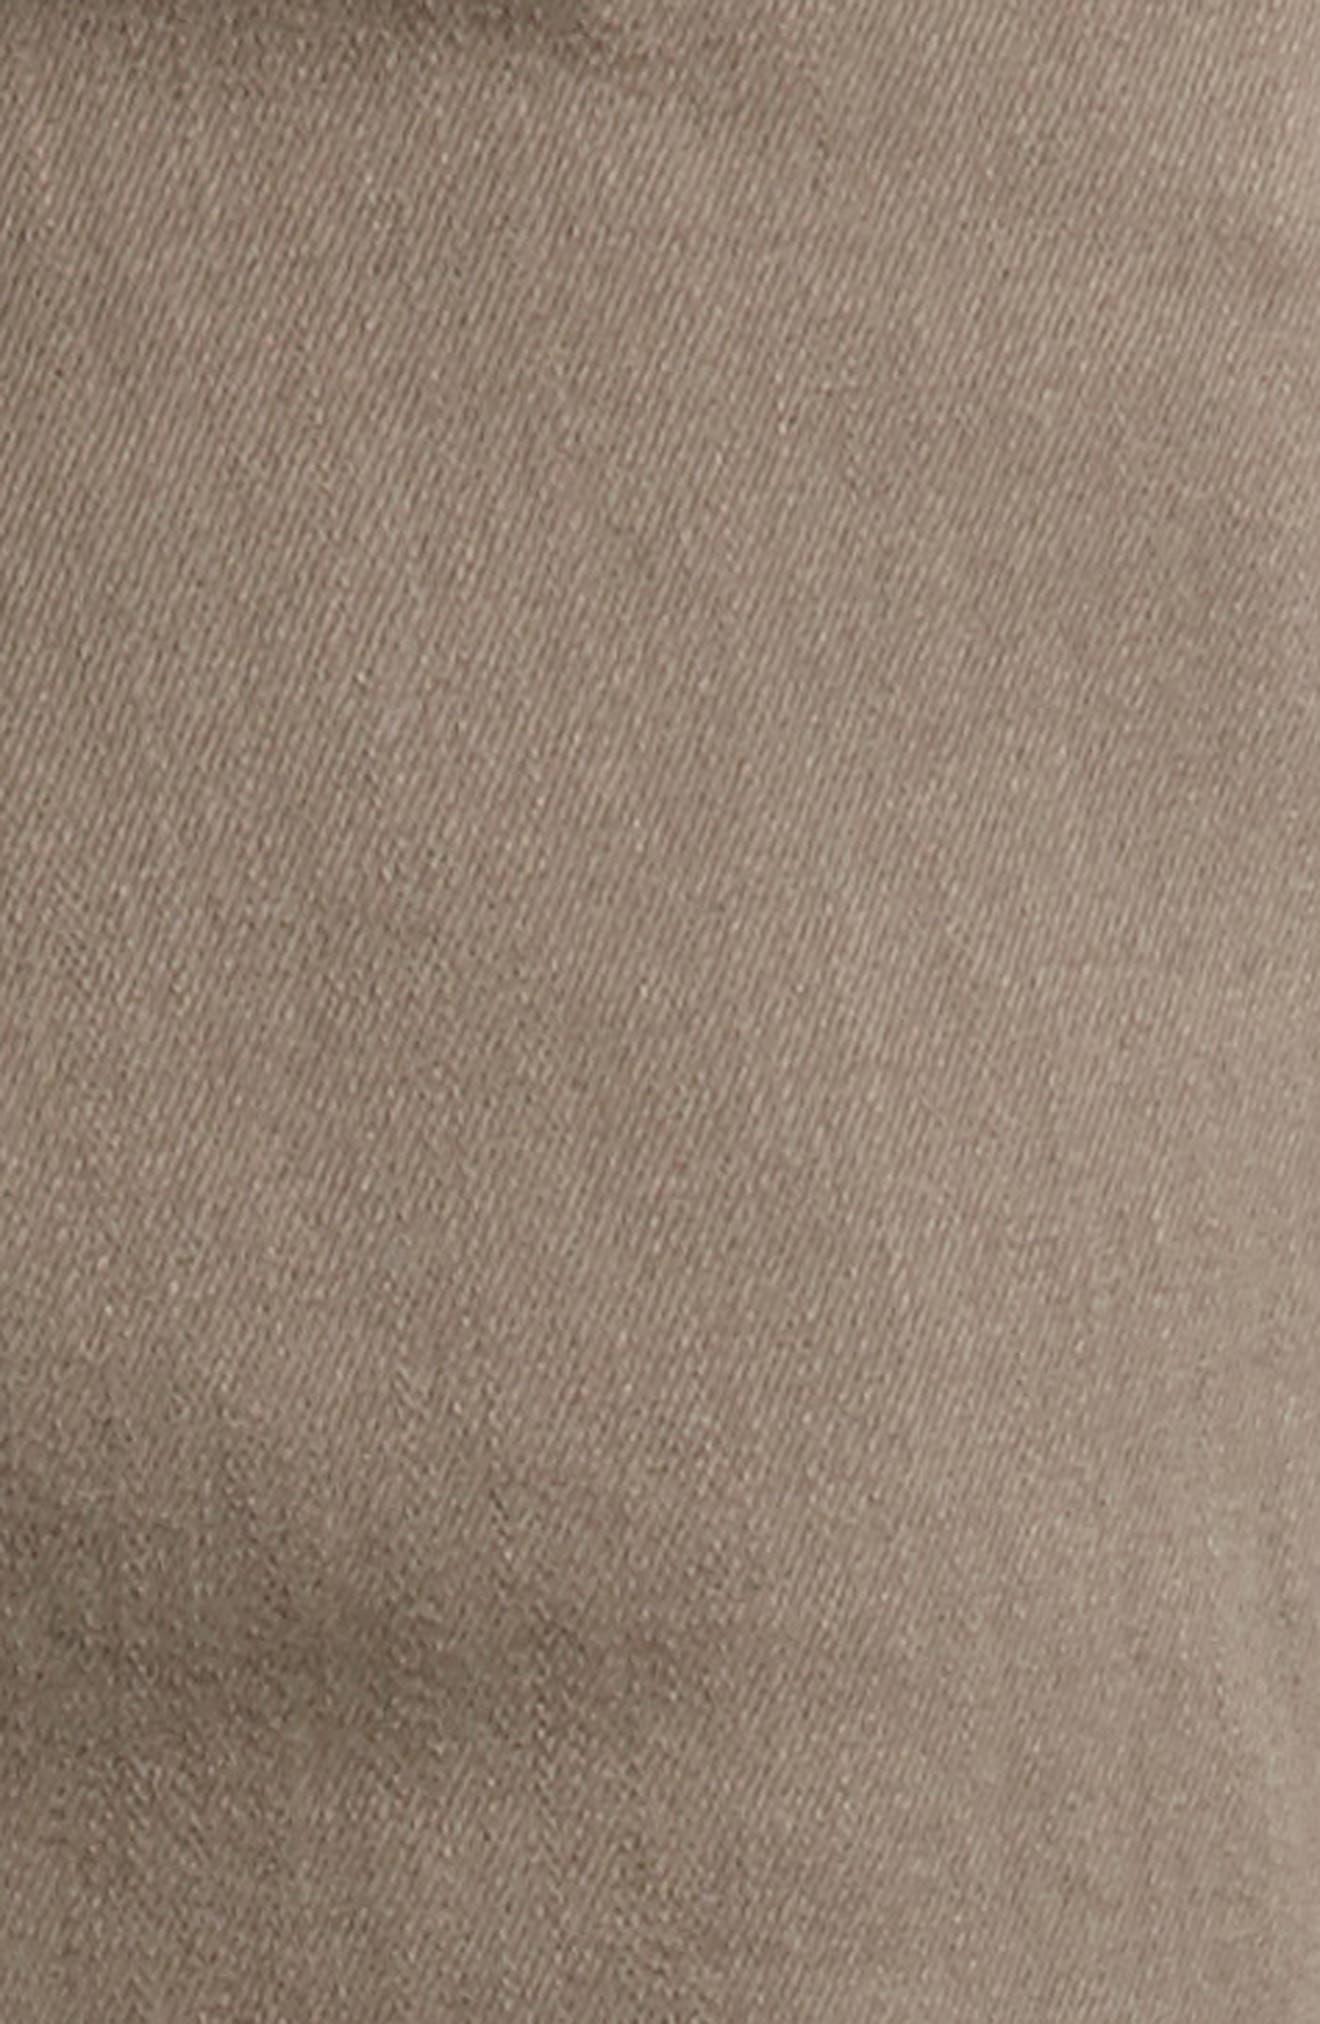 Vorta Slim Fit Chinos,                             Alternate thumbnail 3, color,                             Mushroom